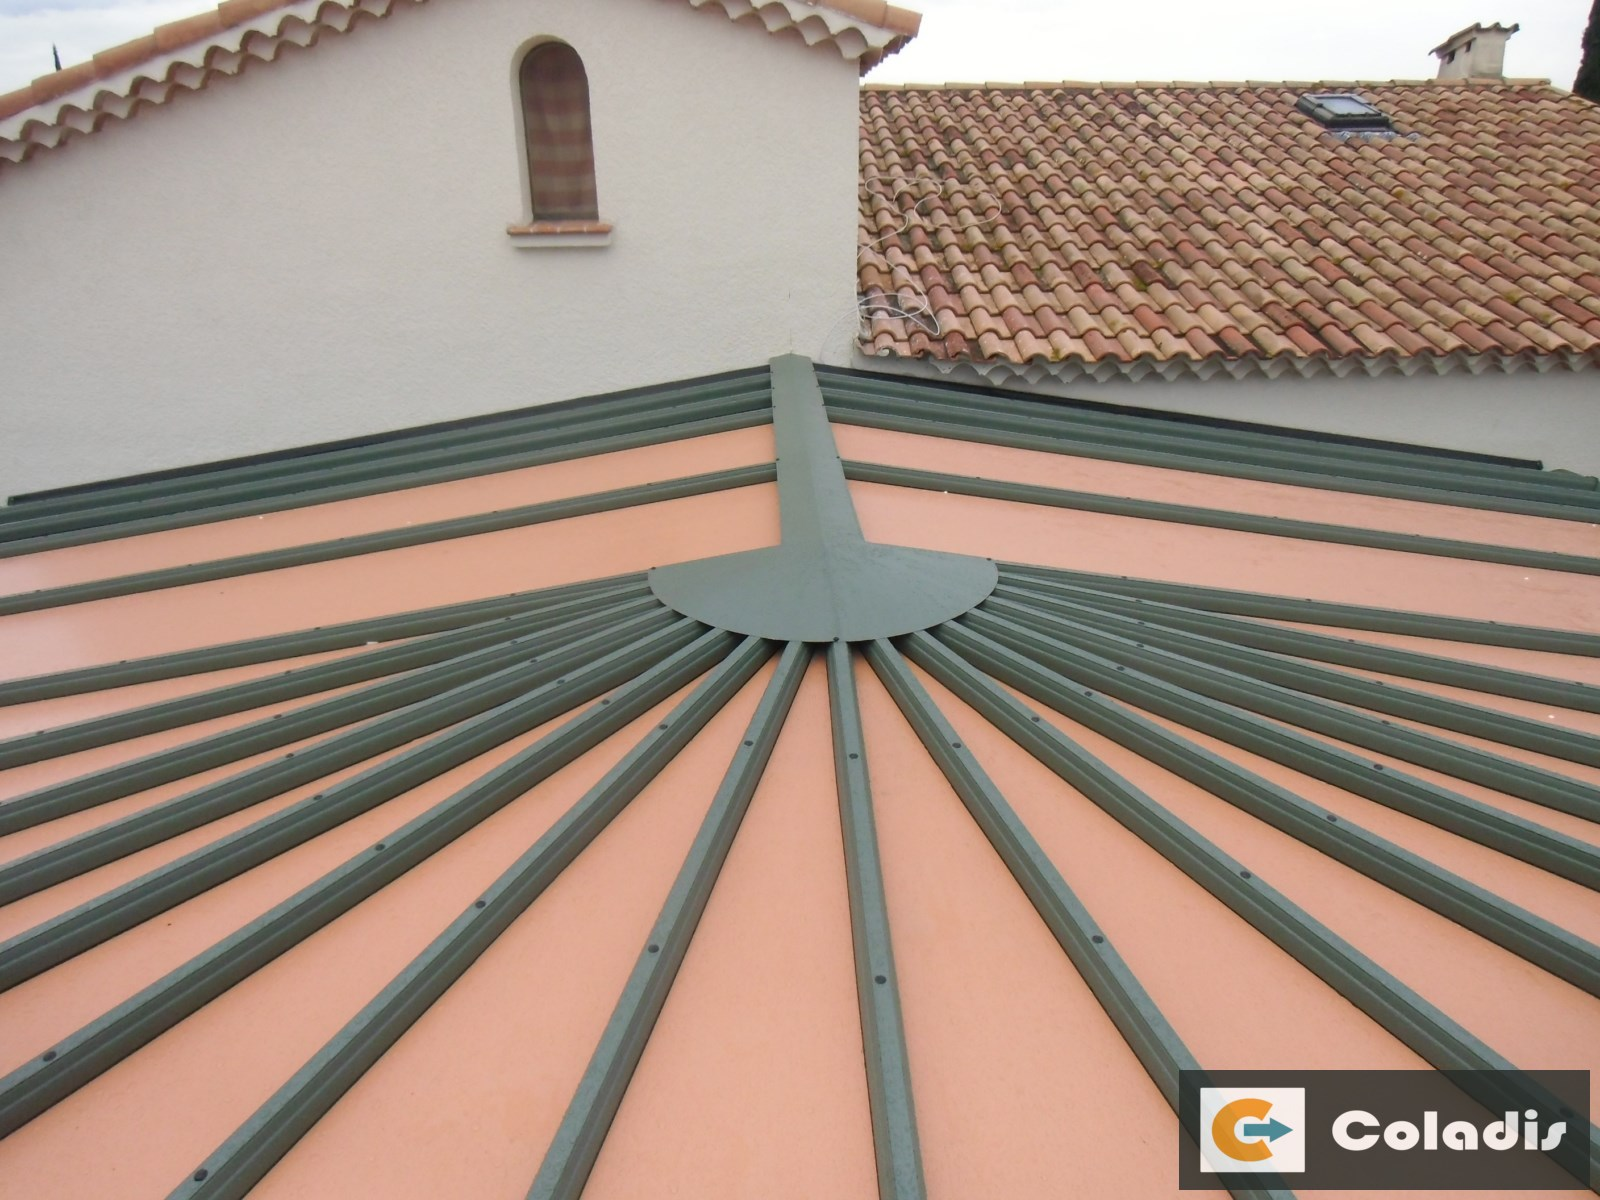 Coladis toiture véranda chevrons aluminium kiosque en étoile Béziers Hérault